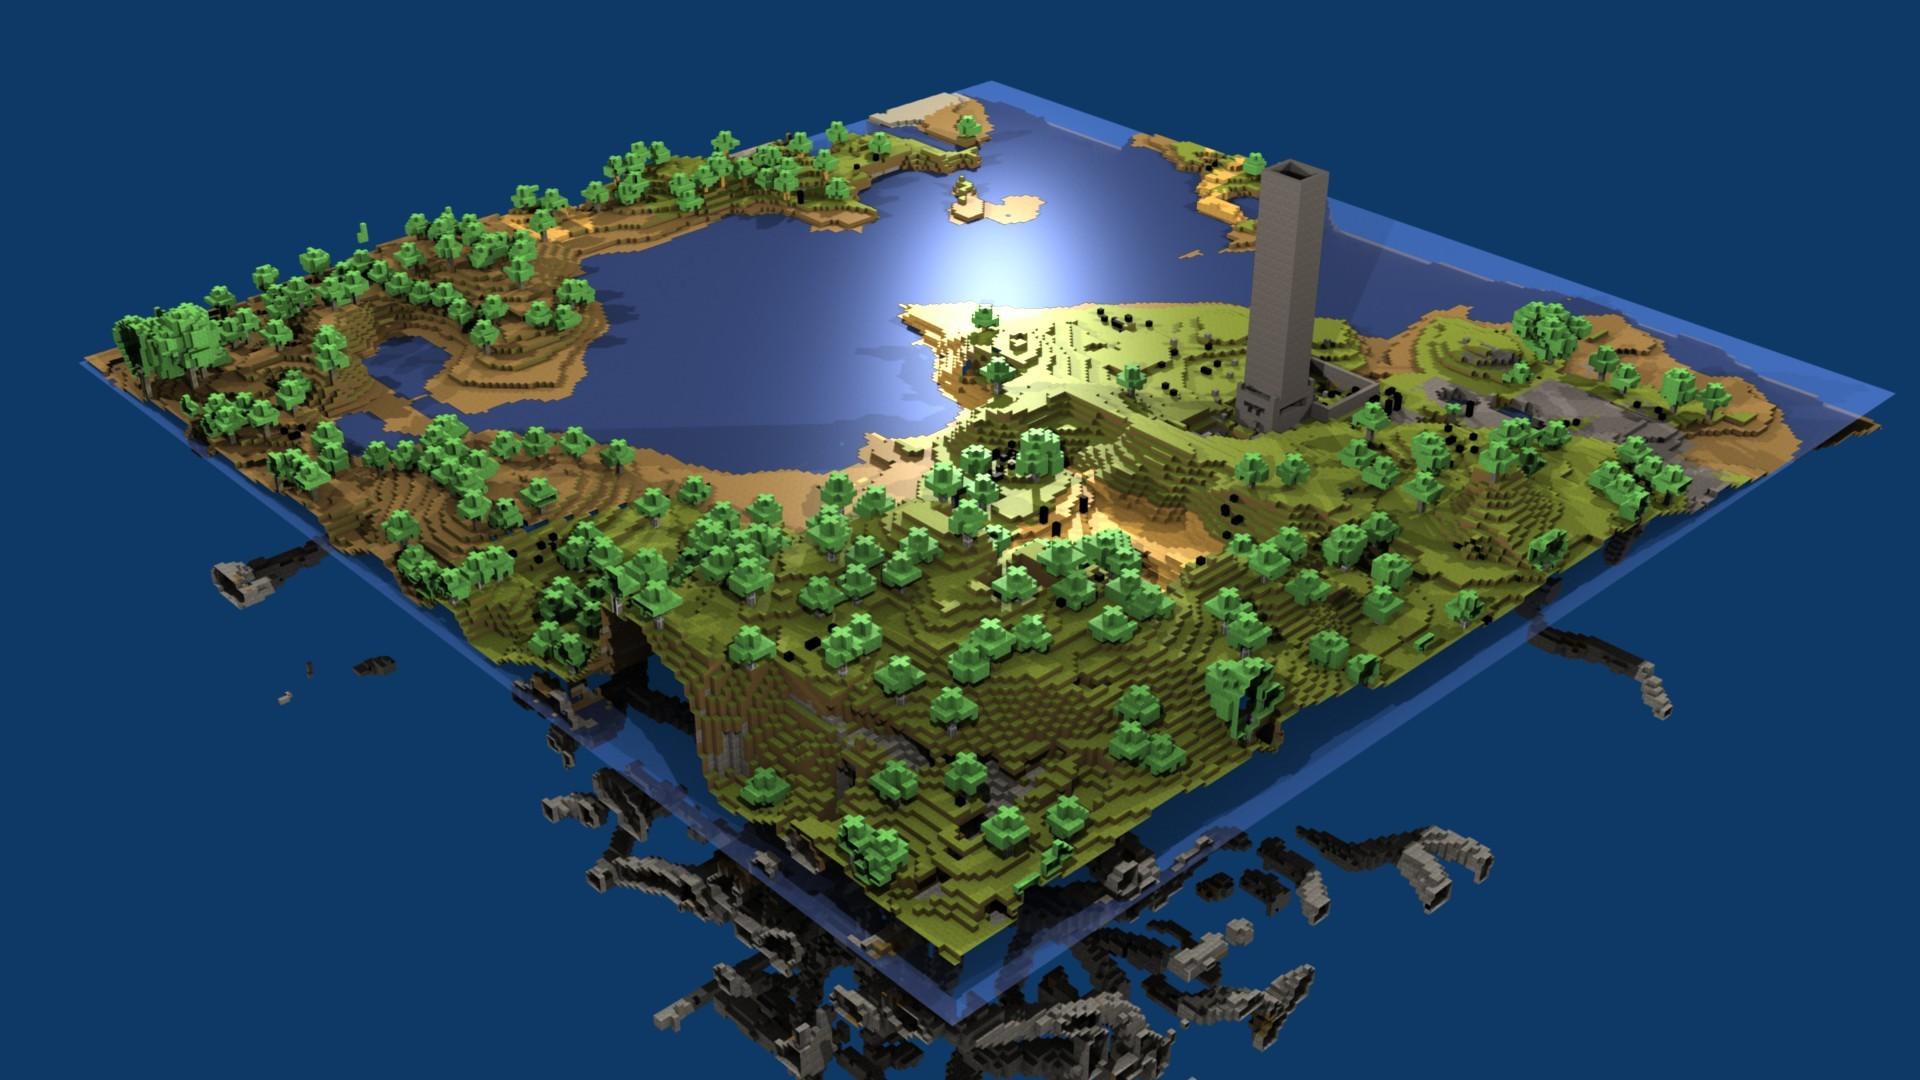 Amazing Wallpaper Minecraft Gamer - 1920x1080-minecraft-wallpaper-23  Pic_137255.jpg